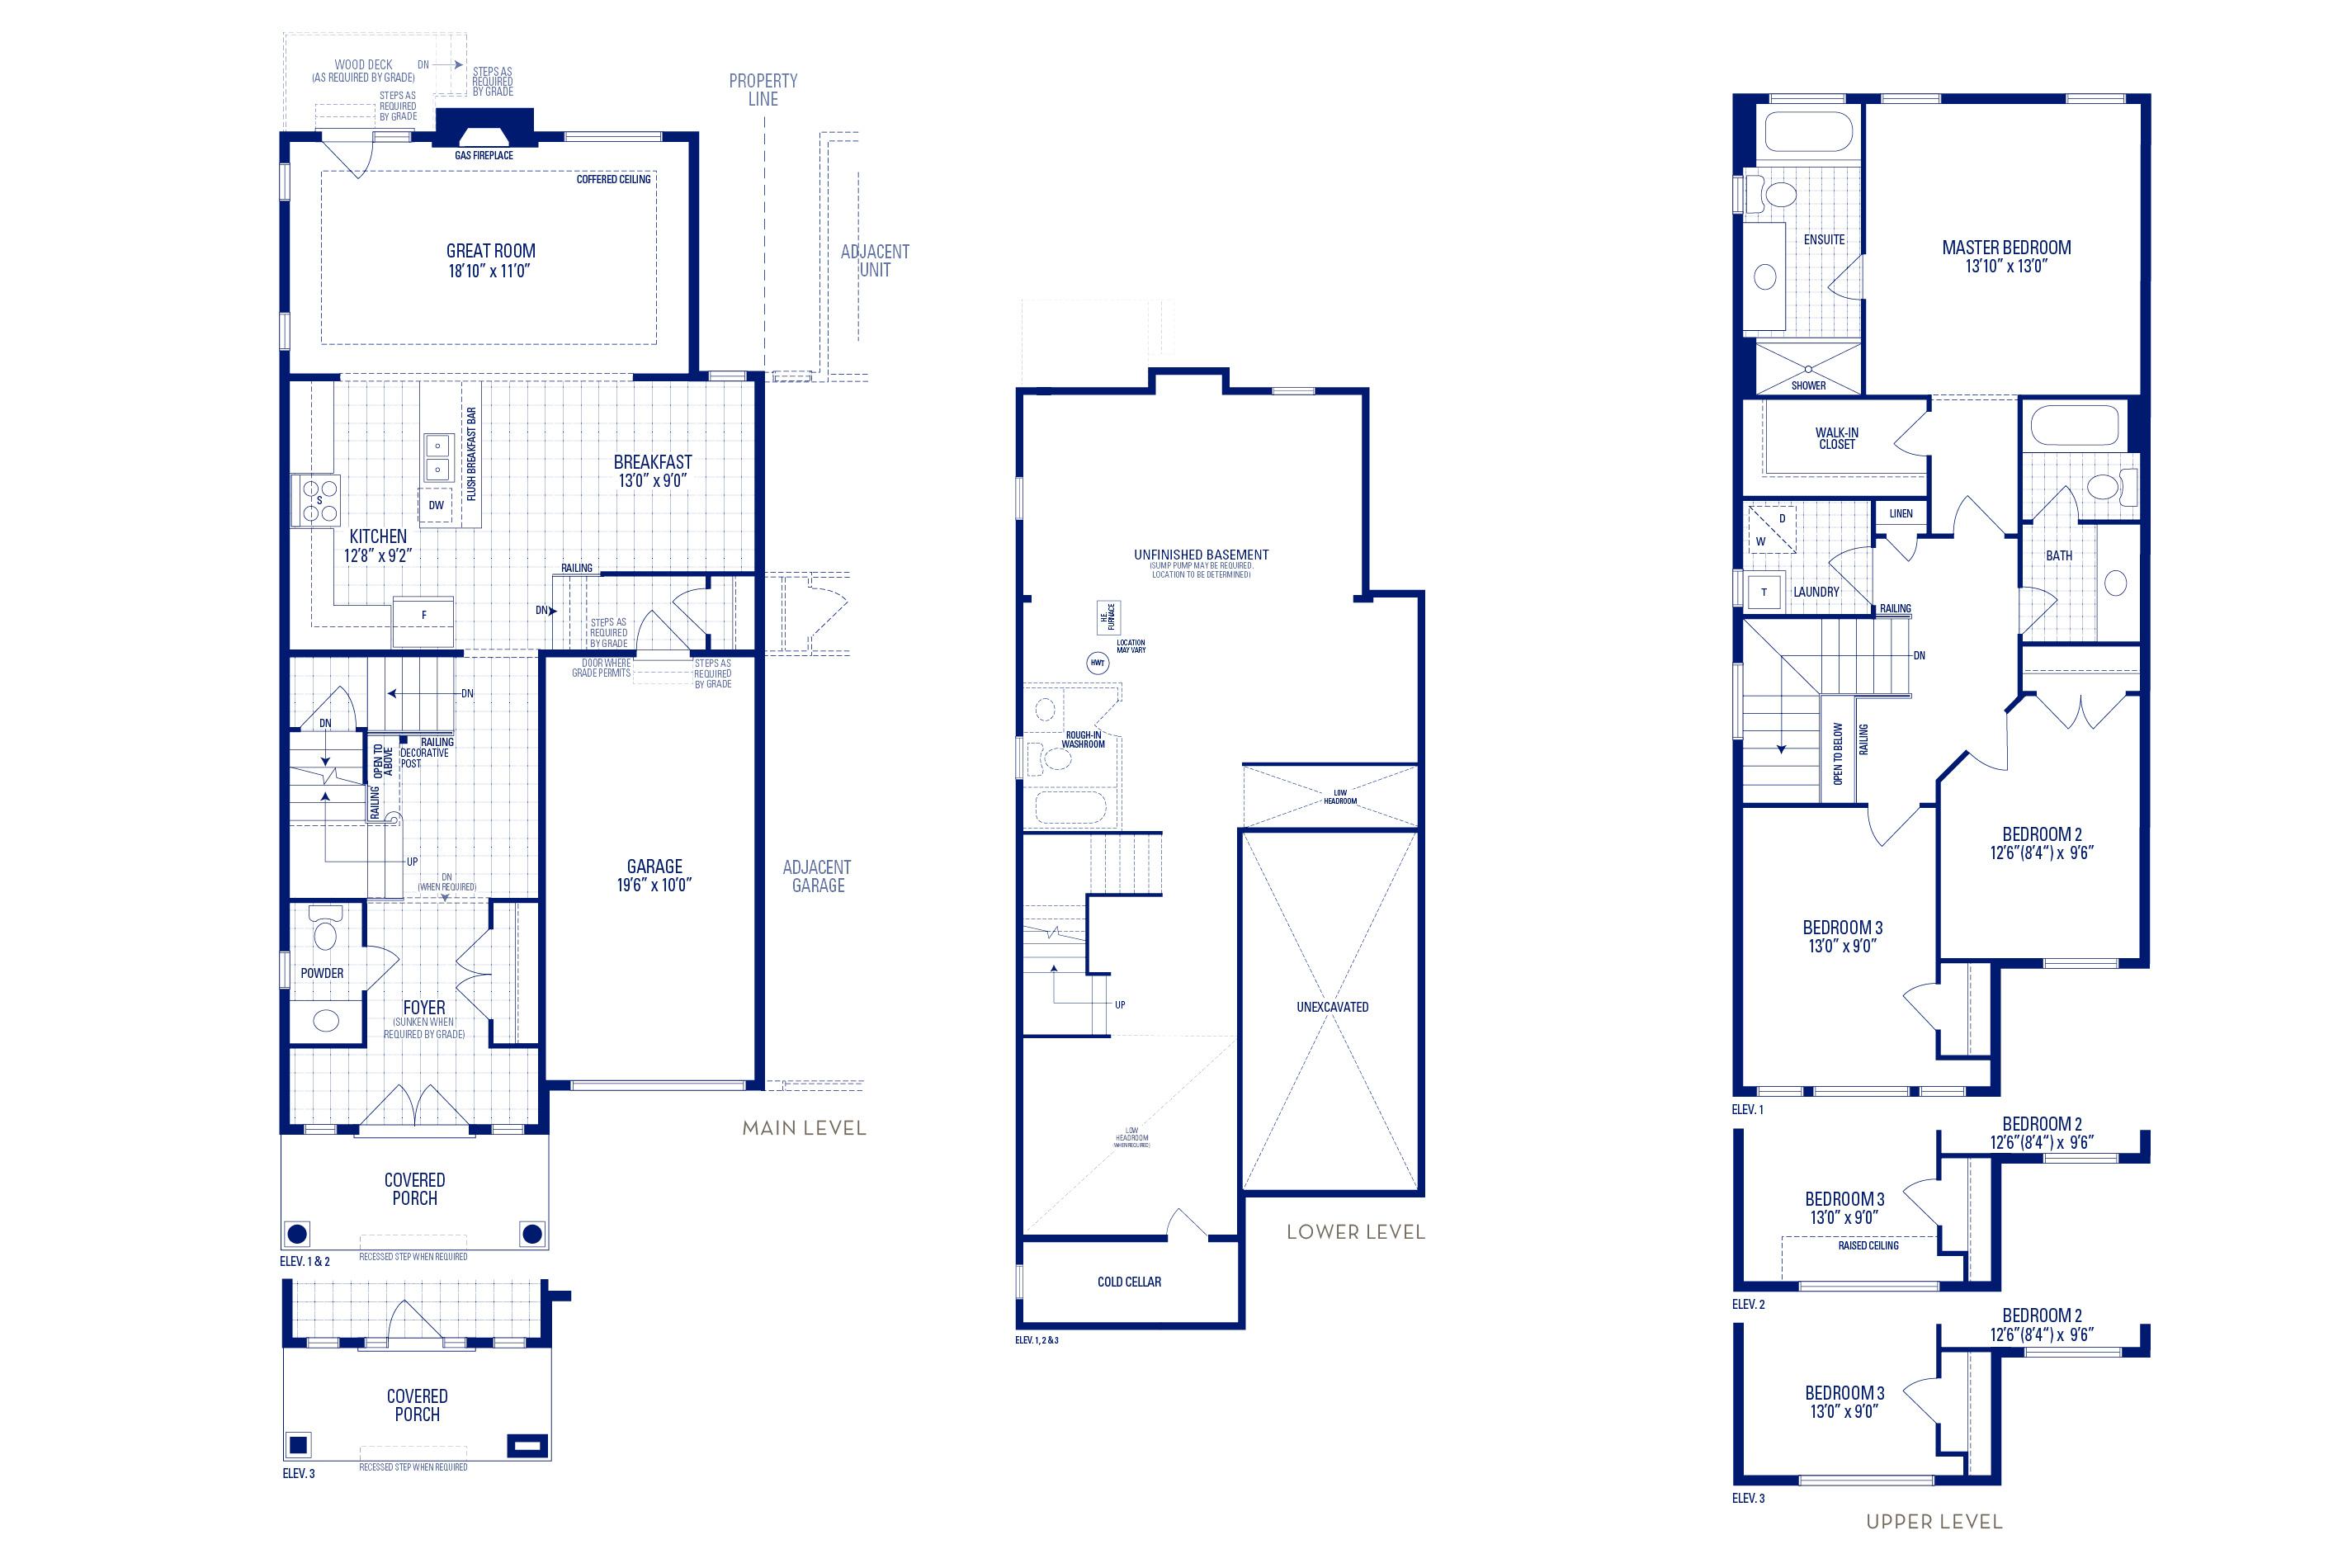 Newberry 01 Elev. 1 Floorplan